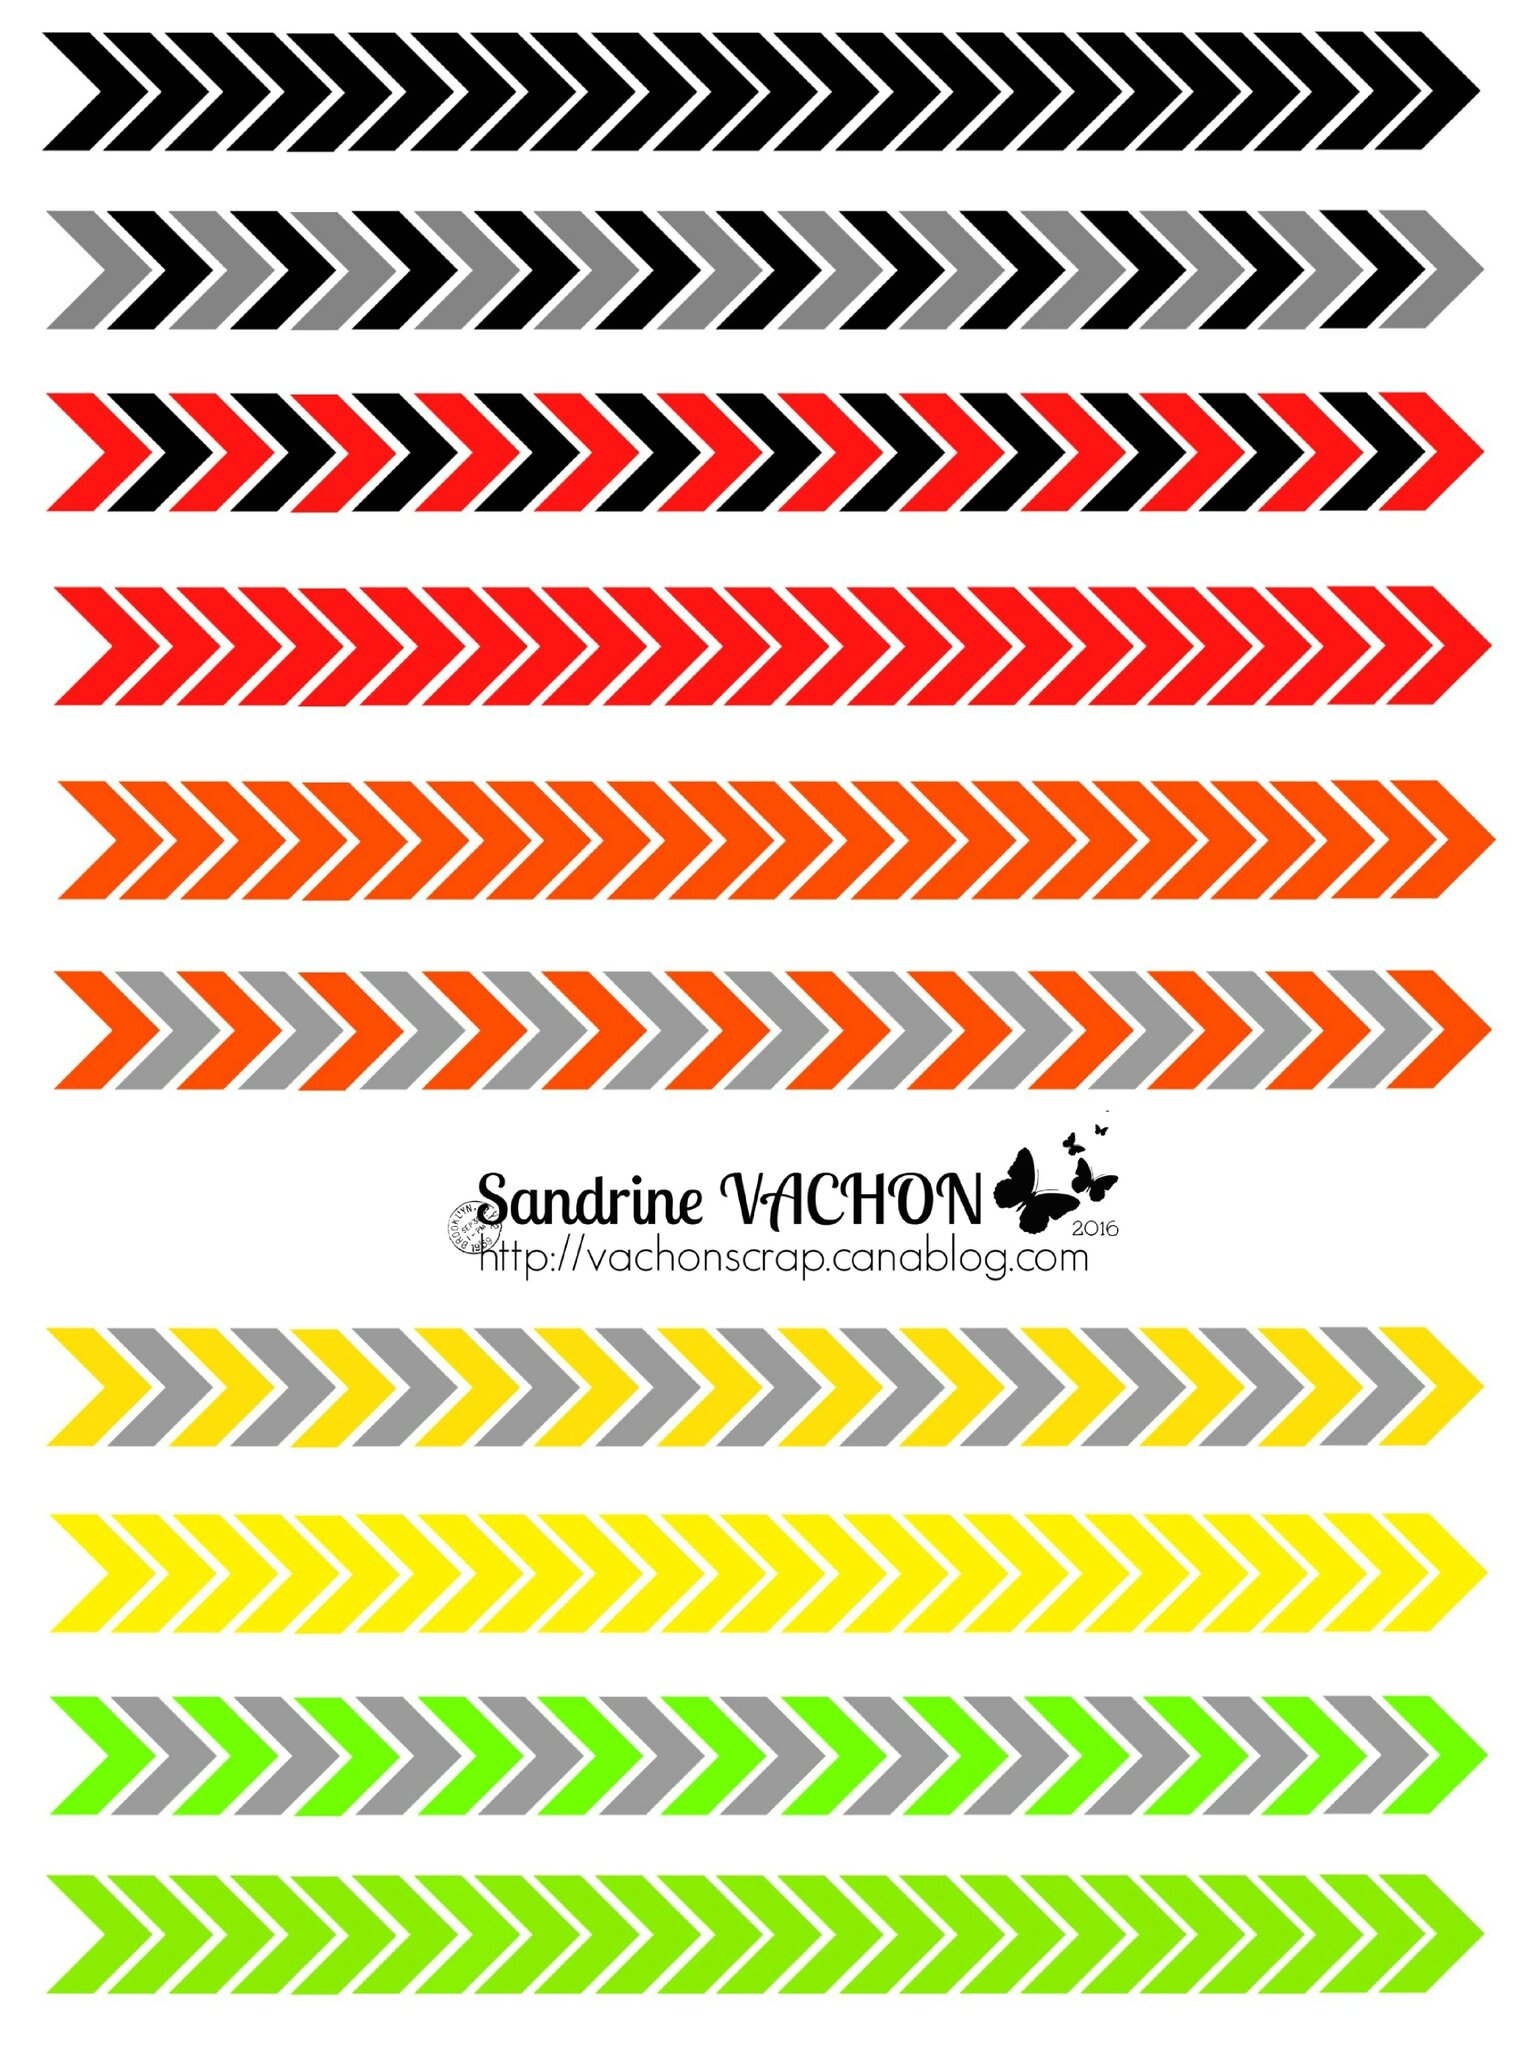 Sandrine VACHON planche 40